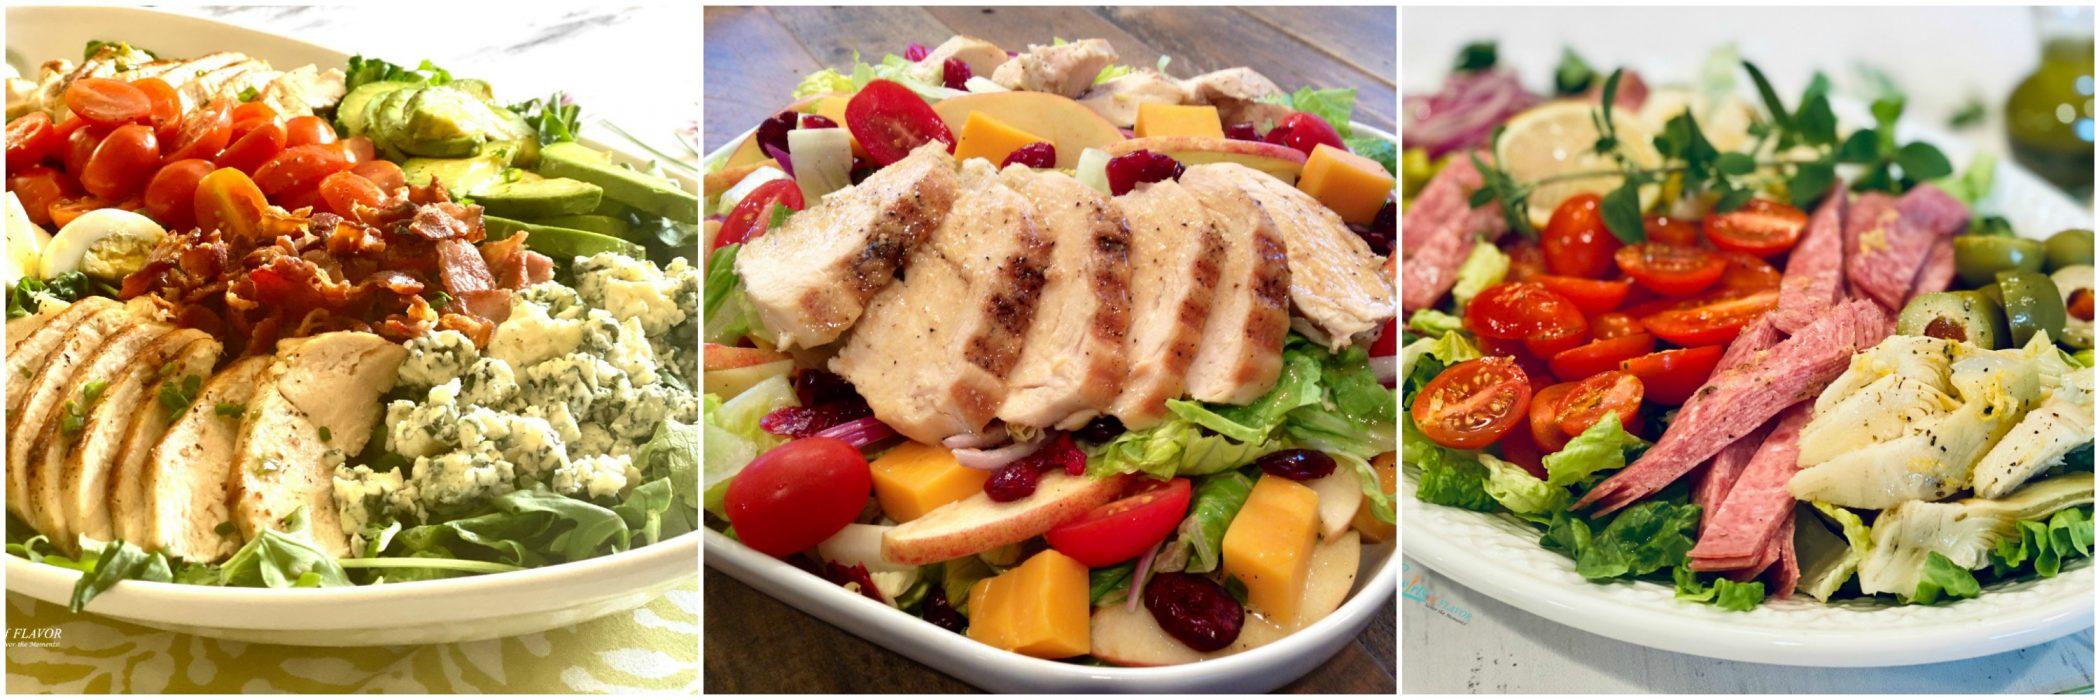 Left to Right: Cobb Salad; Apple Cheddar Chicken Salad; italian Chopped Salad